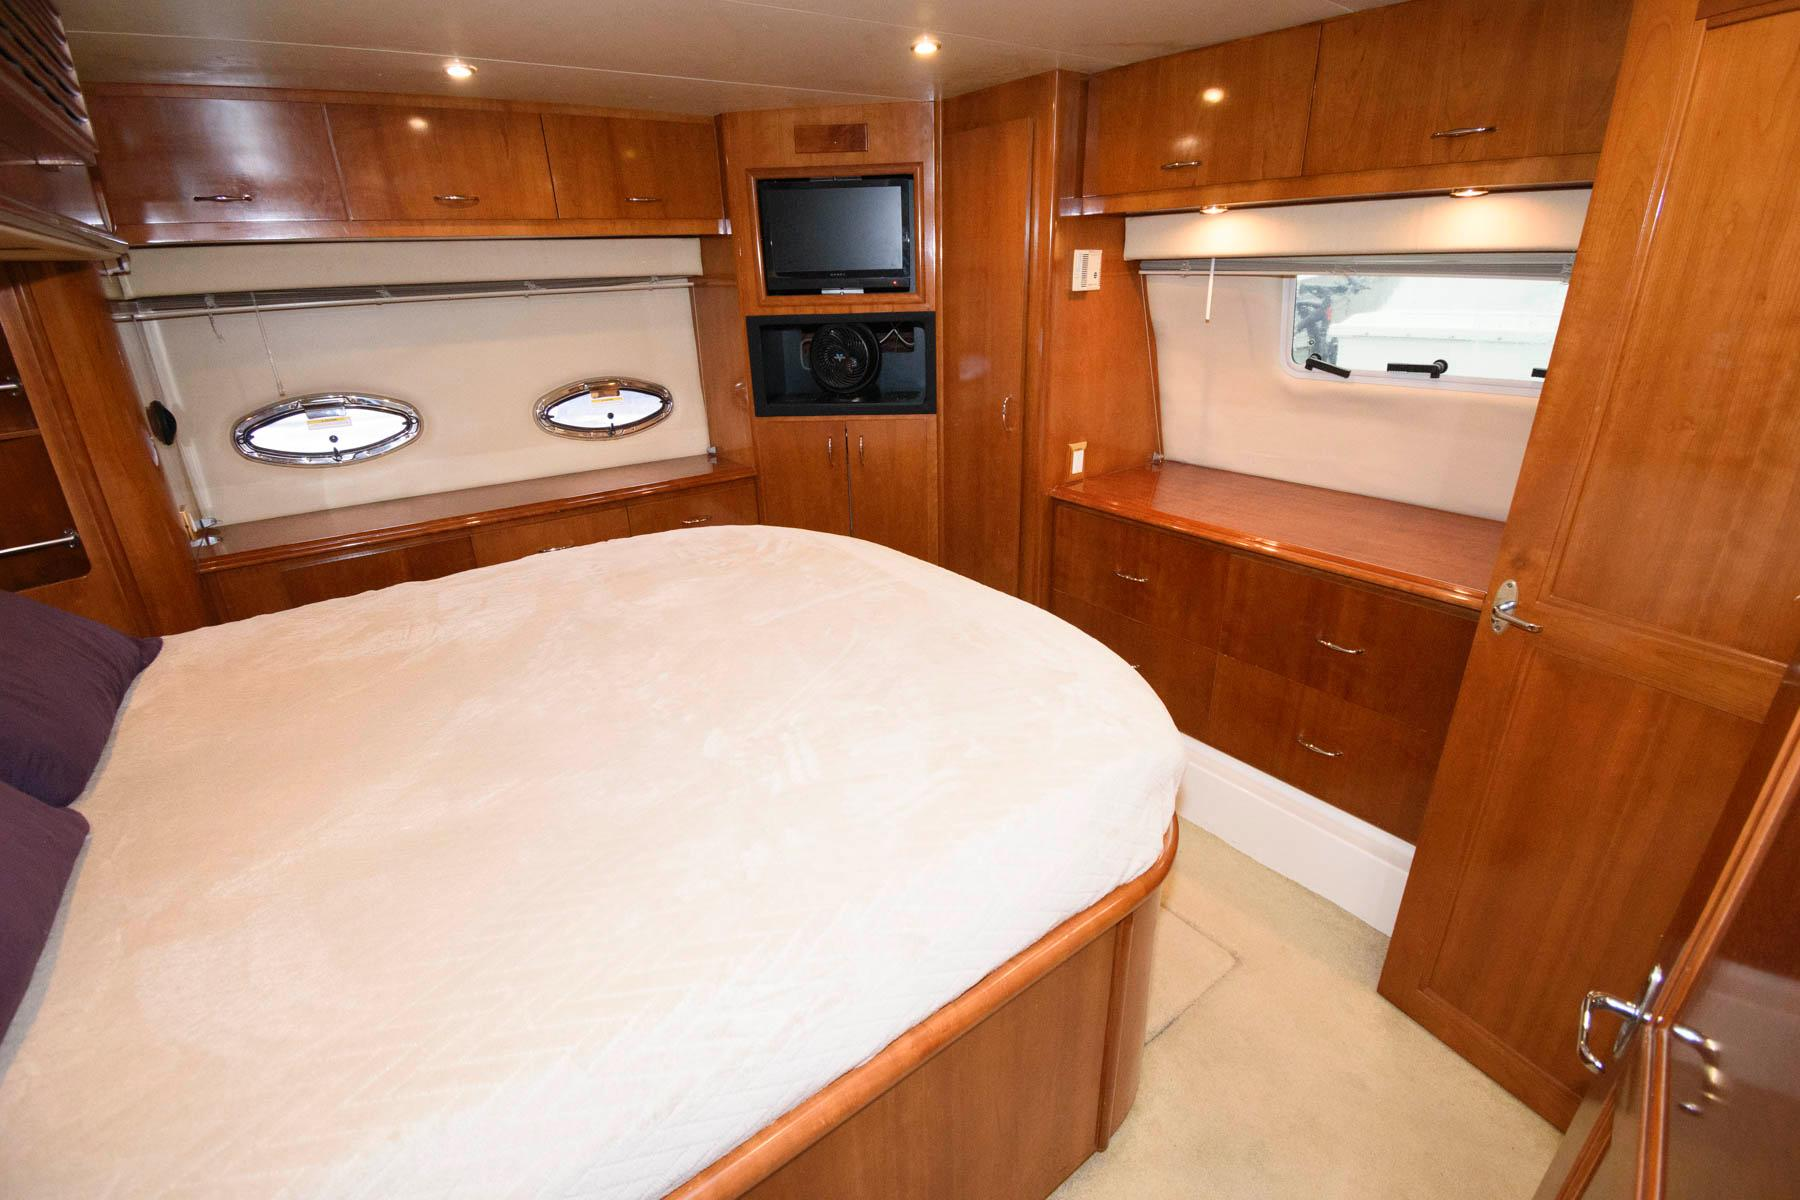 M 6197 KB Knot 10 Yacht Sales